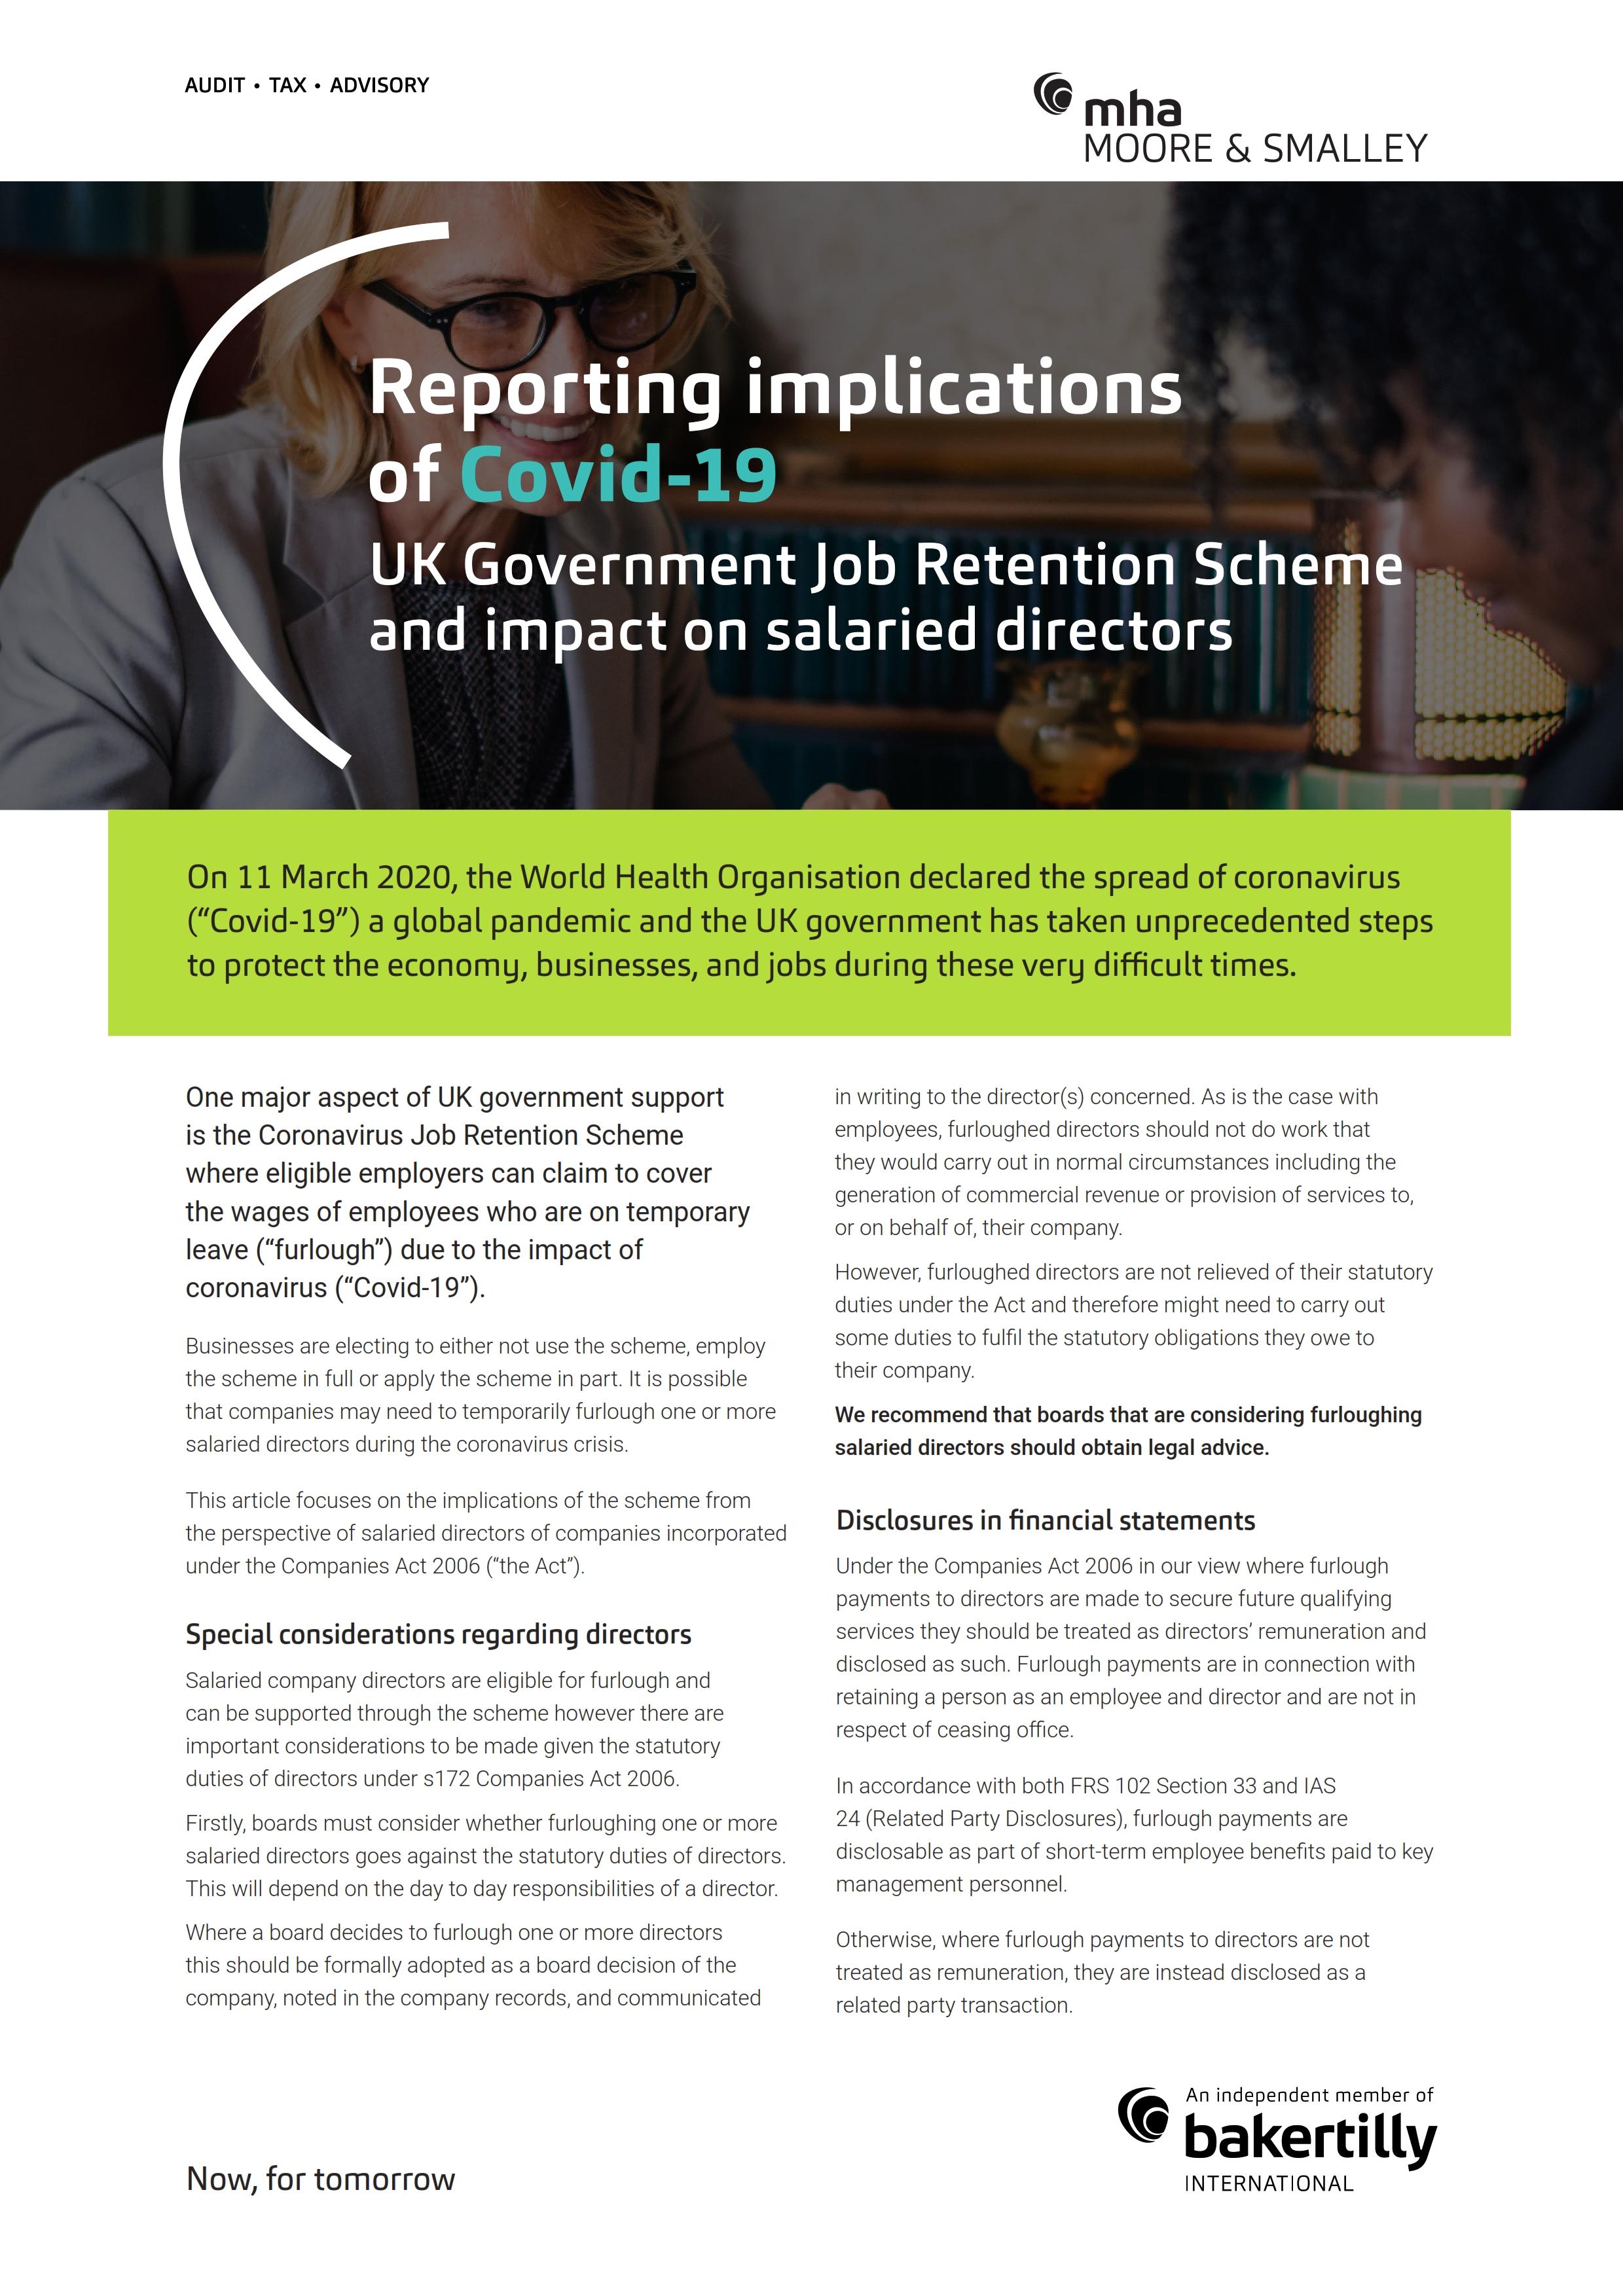 UK Government Job Retention Scheme – impact on salaried directors